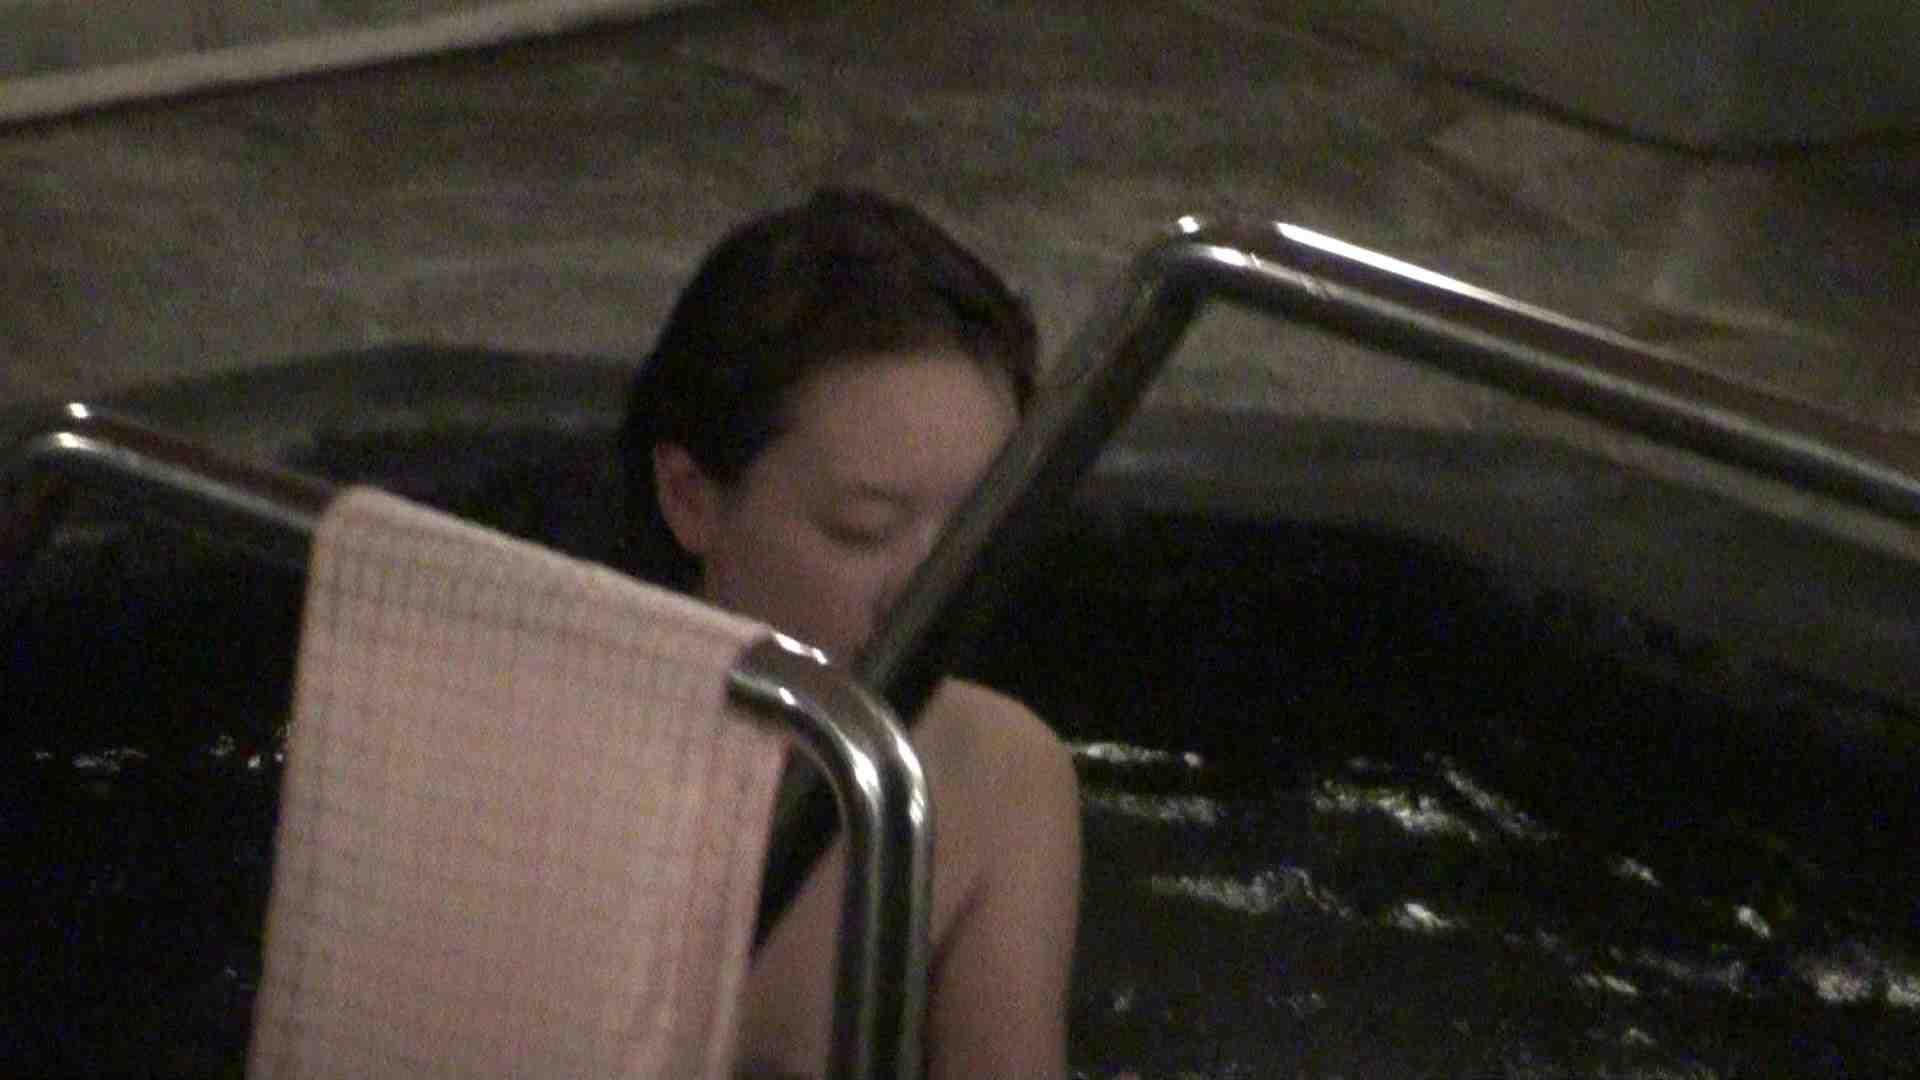 Aquaな露天風呂Vol.334 露天風呂突入 のぞき動画画像 102pic 77